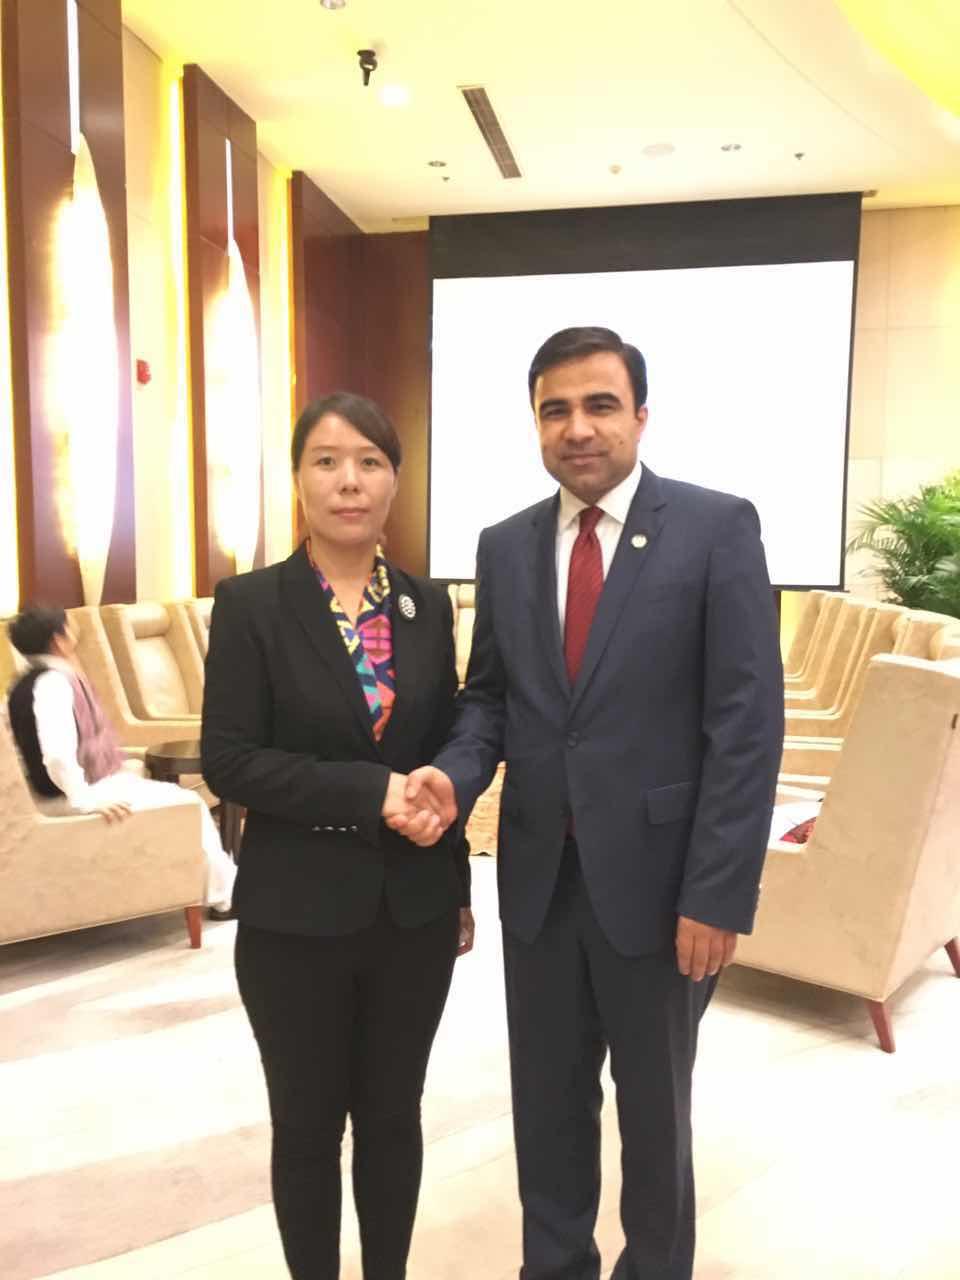 Secretary General Cui Jianghong and Afghan Ambassador to China H.E.Mr.Janan Mosazai